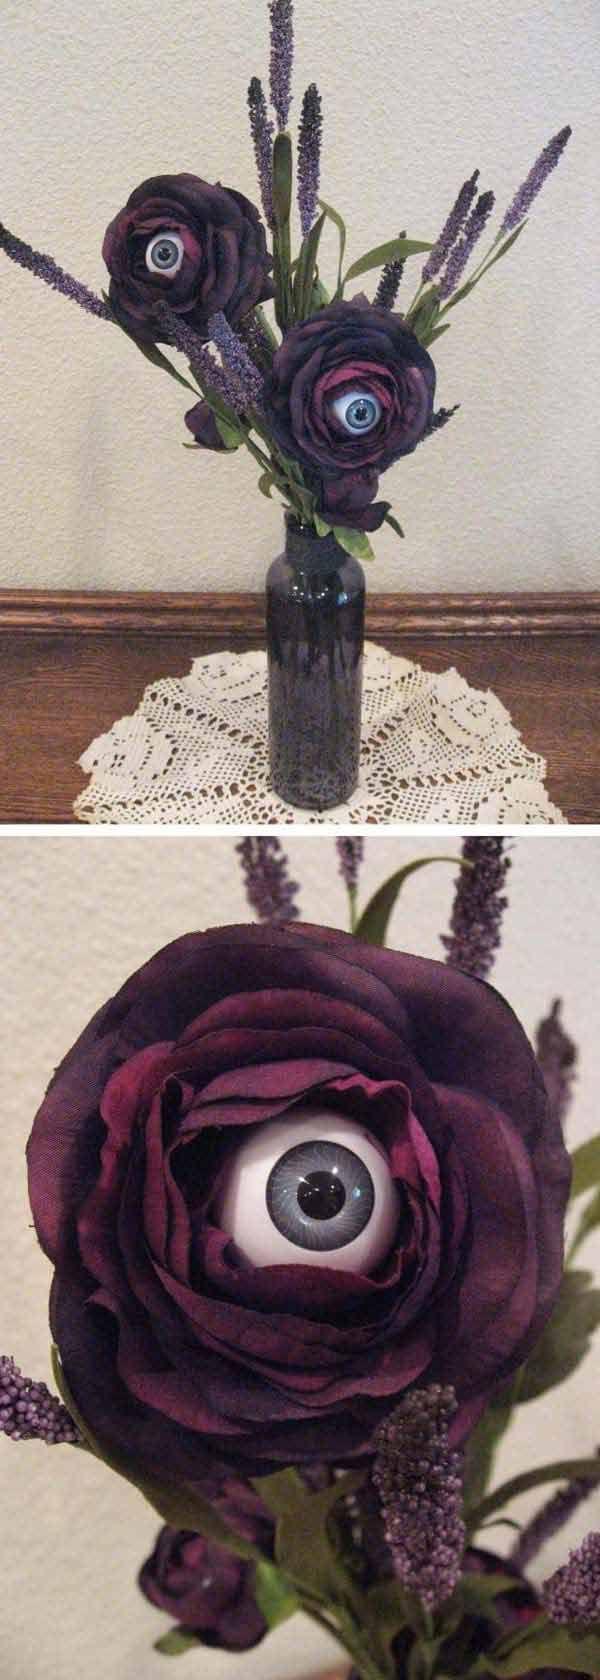 Eyeball Flower - 42 Last-Minute Cheap DIY Halloween Decorations You Can Easily Make